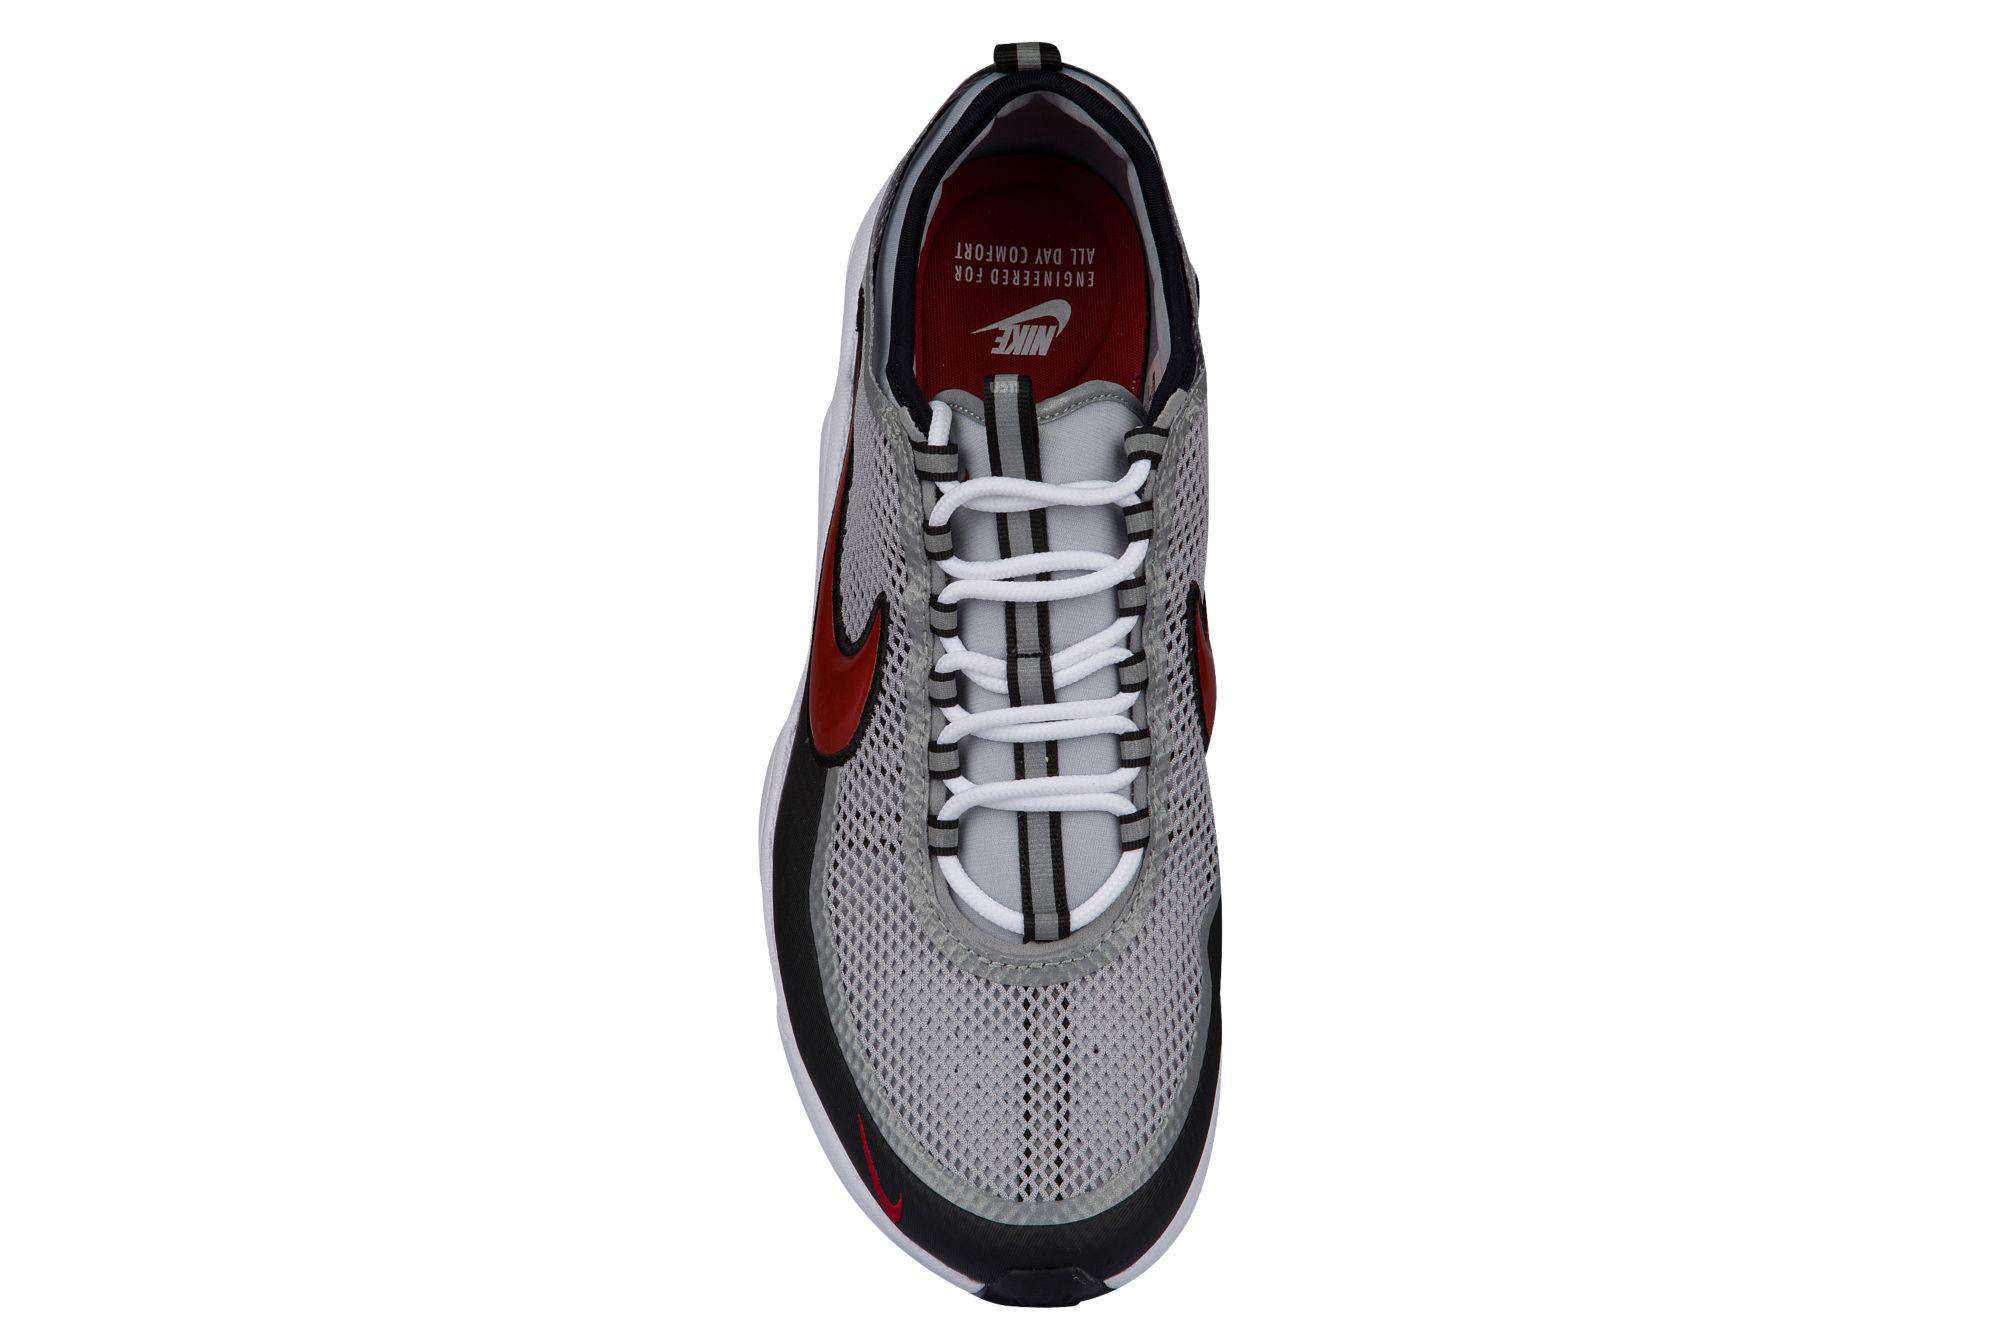 5469bbb4768 Nike Air Zoom Spiridon Ultra